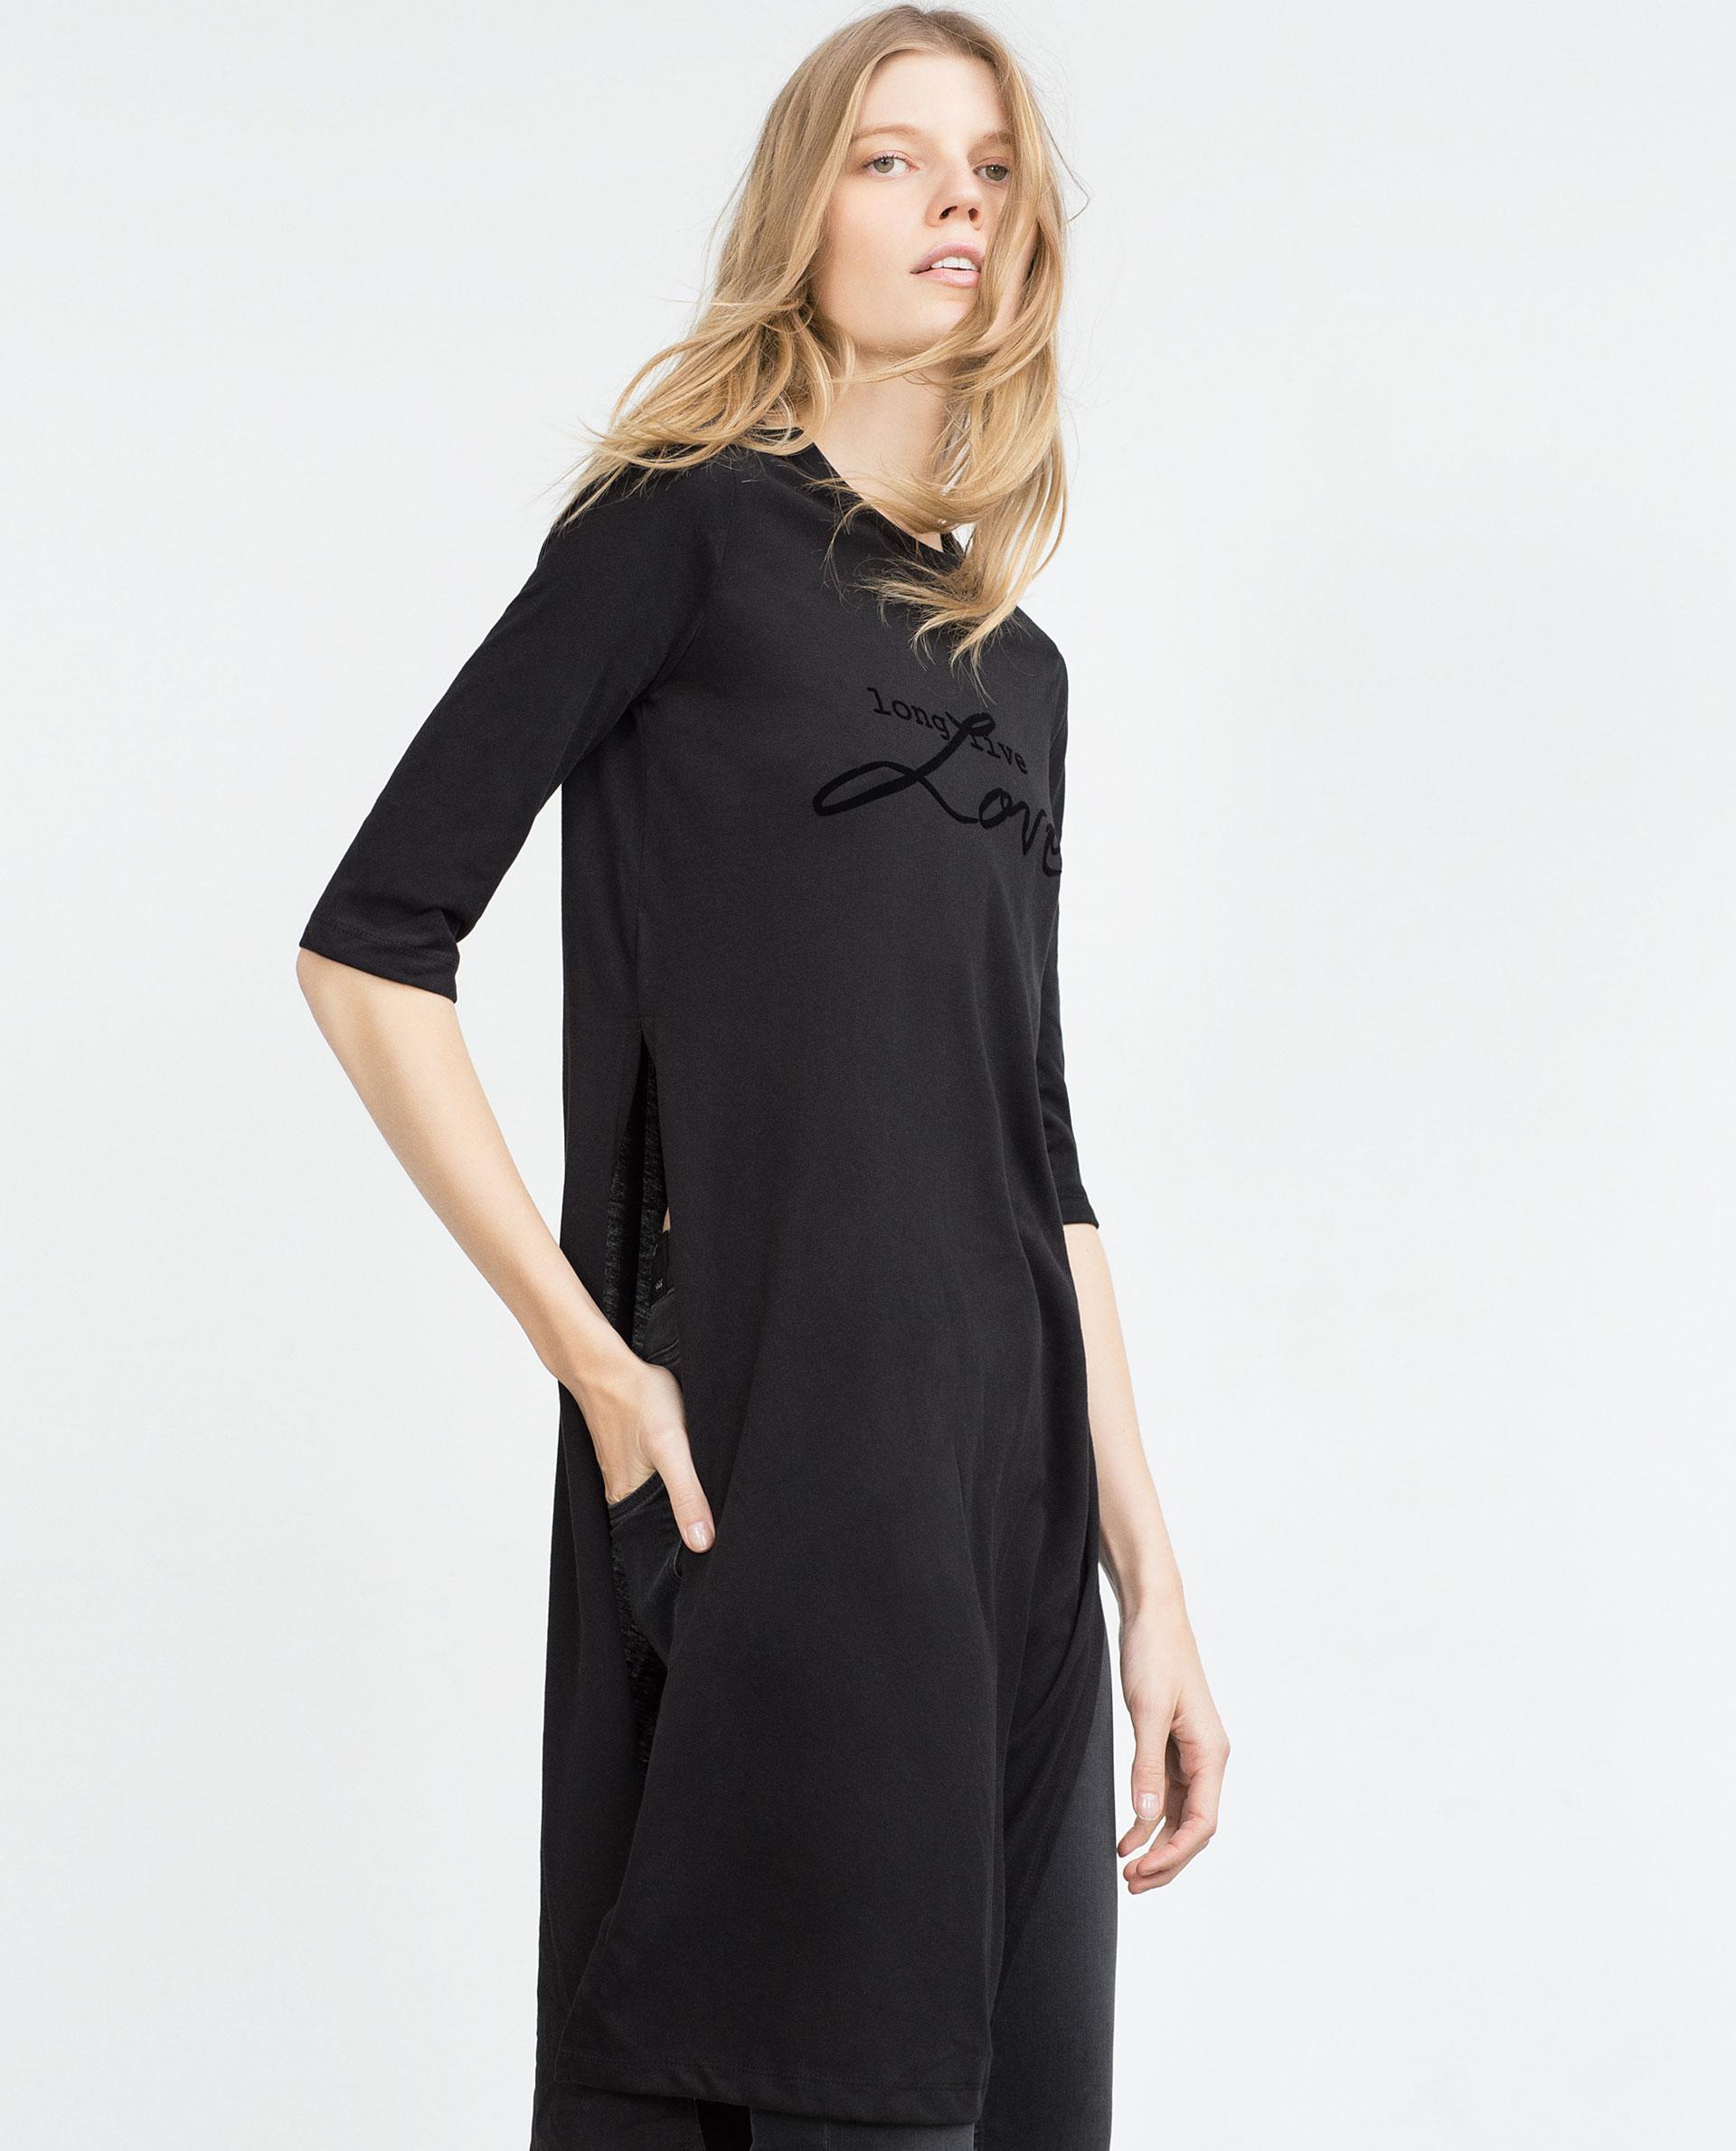 Zara long t shirt with slits in black lyst for Zara black t shirt dress